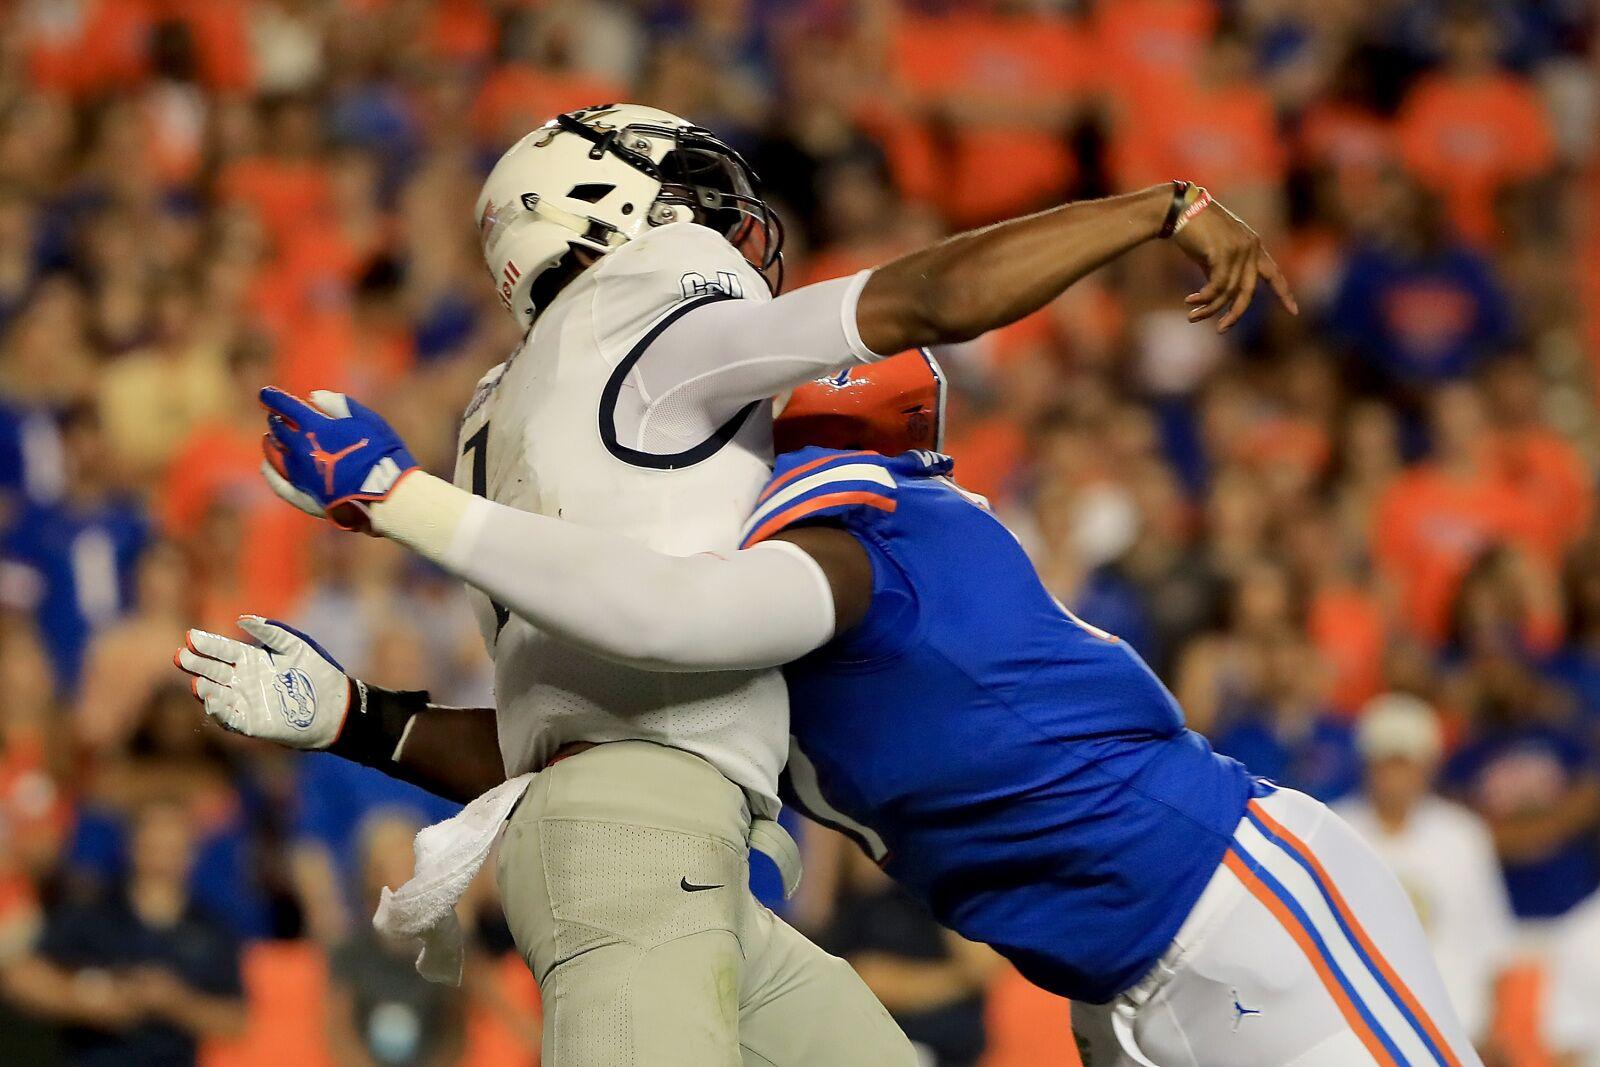 Florida football: Malik Langham chooses Vanderbilt, according to reports